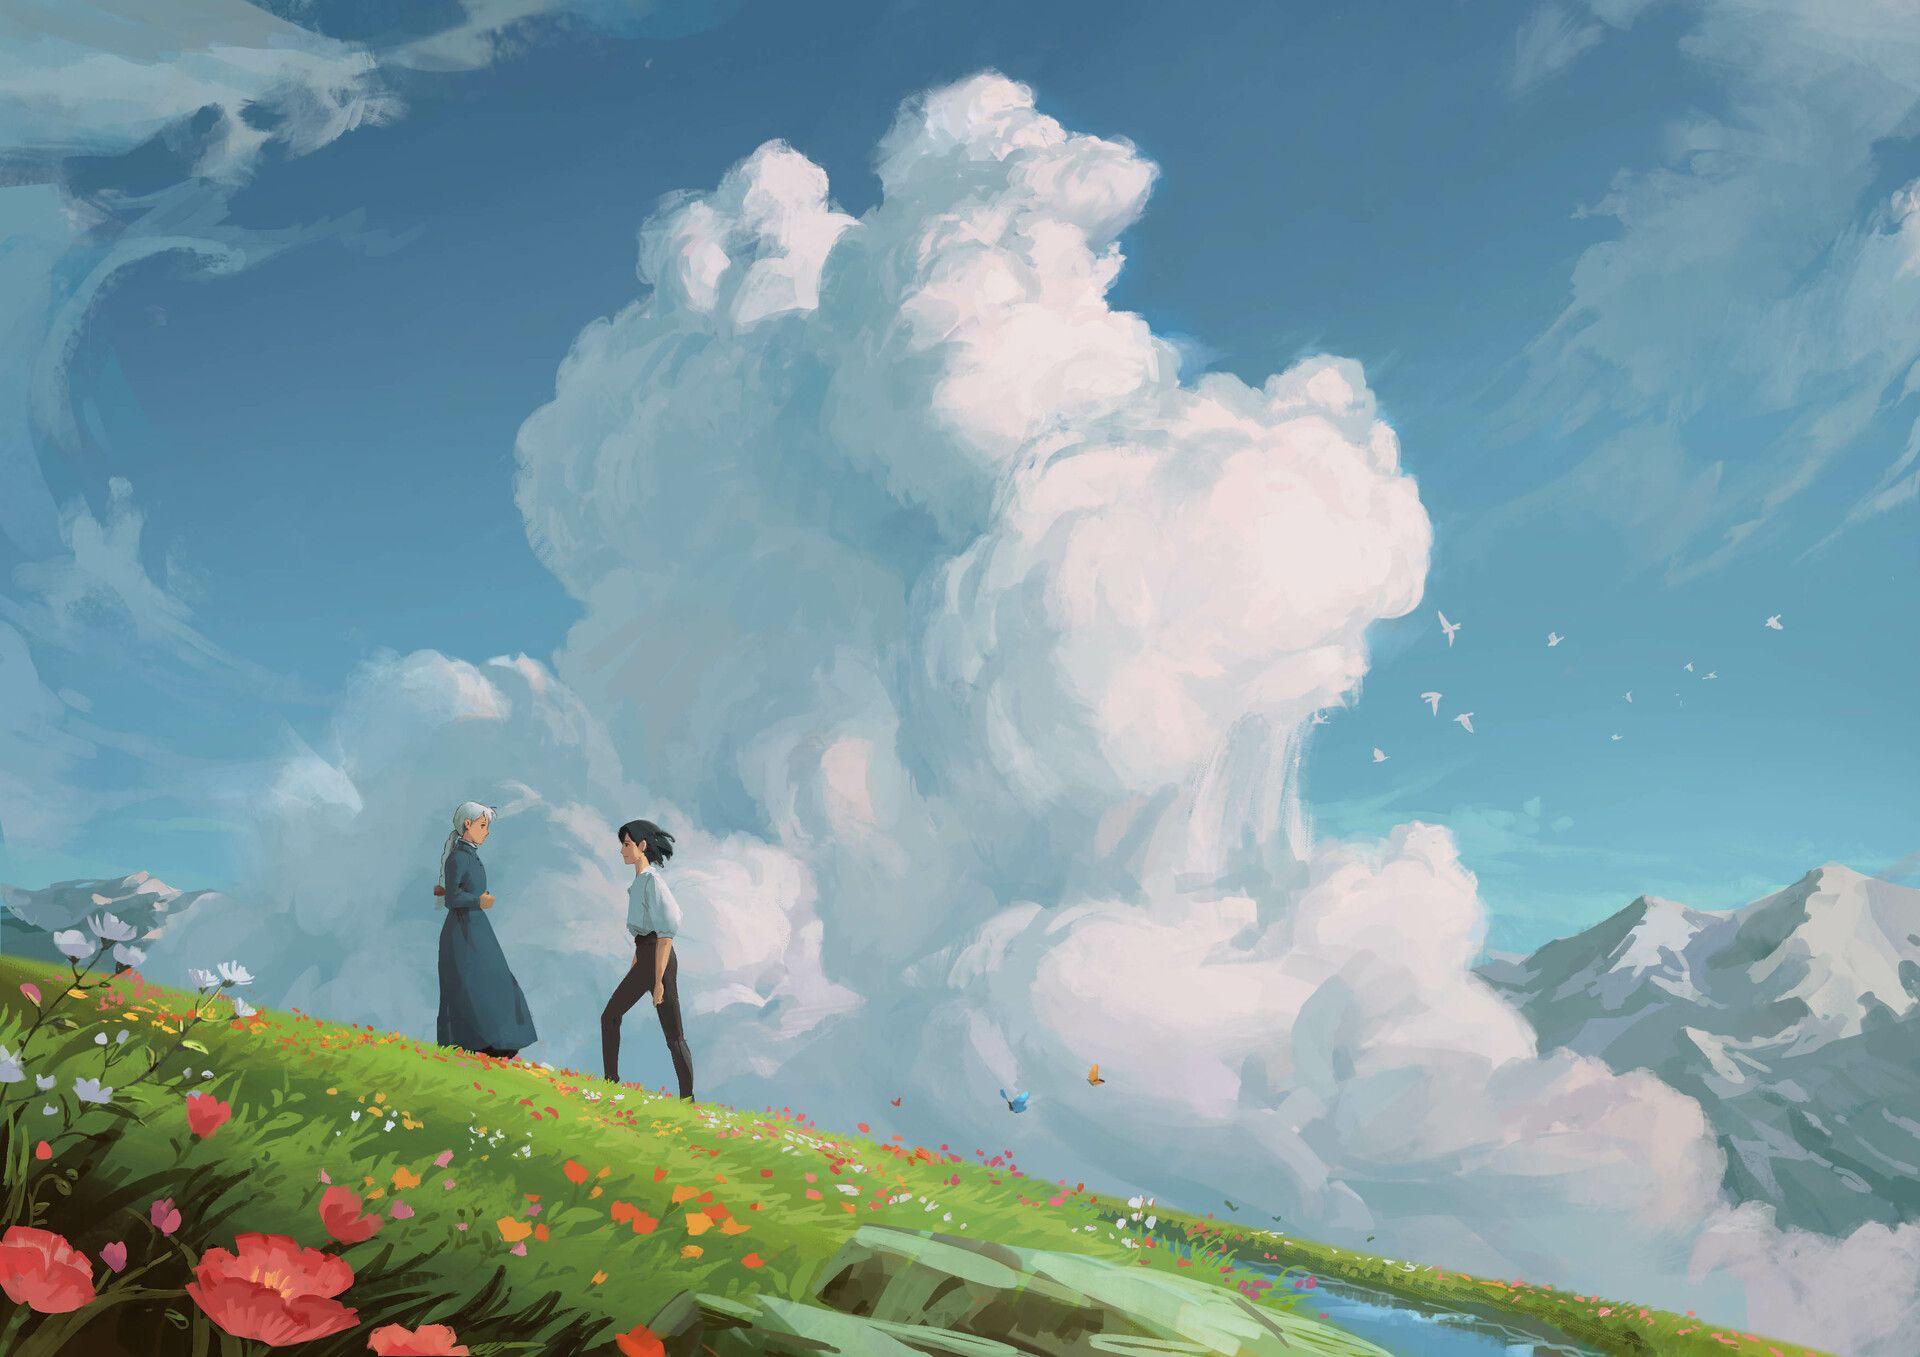 Https Initiate Alphacoders Com Download Wallpaper 1053126 Images8 Jpg 1586048650988832 In 2020 Ghibli Artwork Studio Ghibli Background Anime Scenery